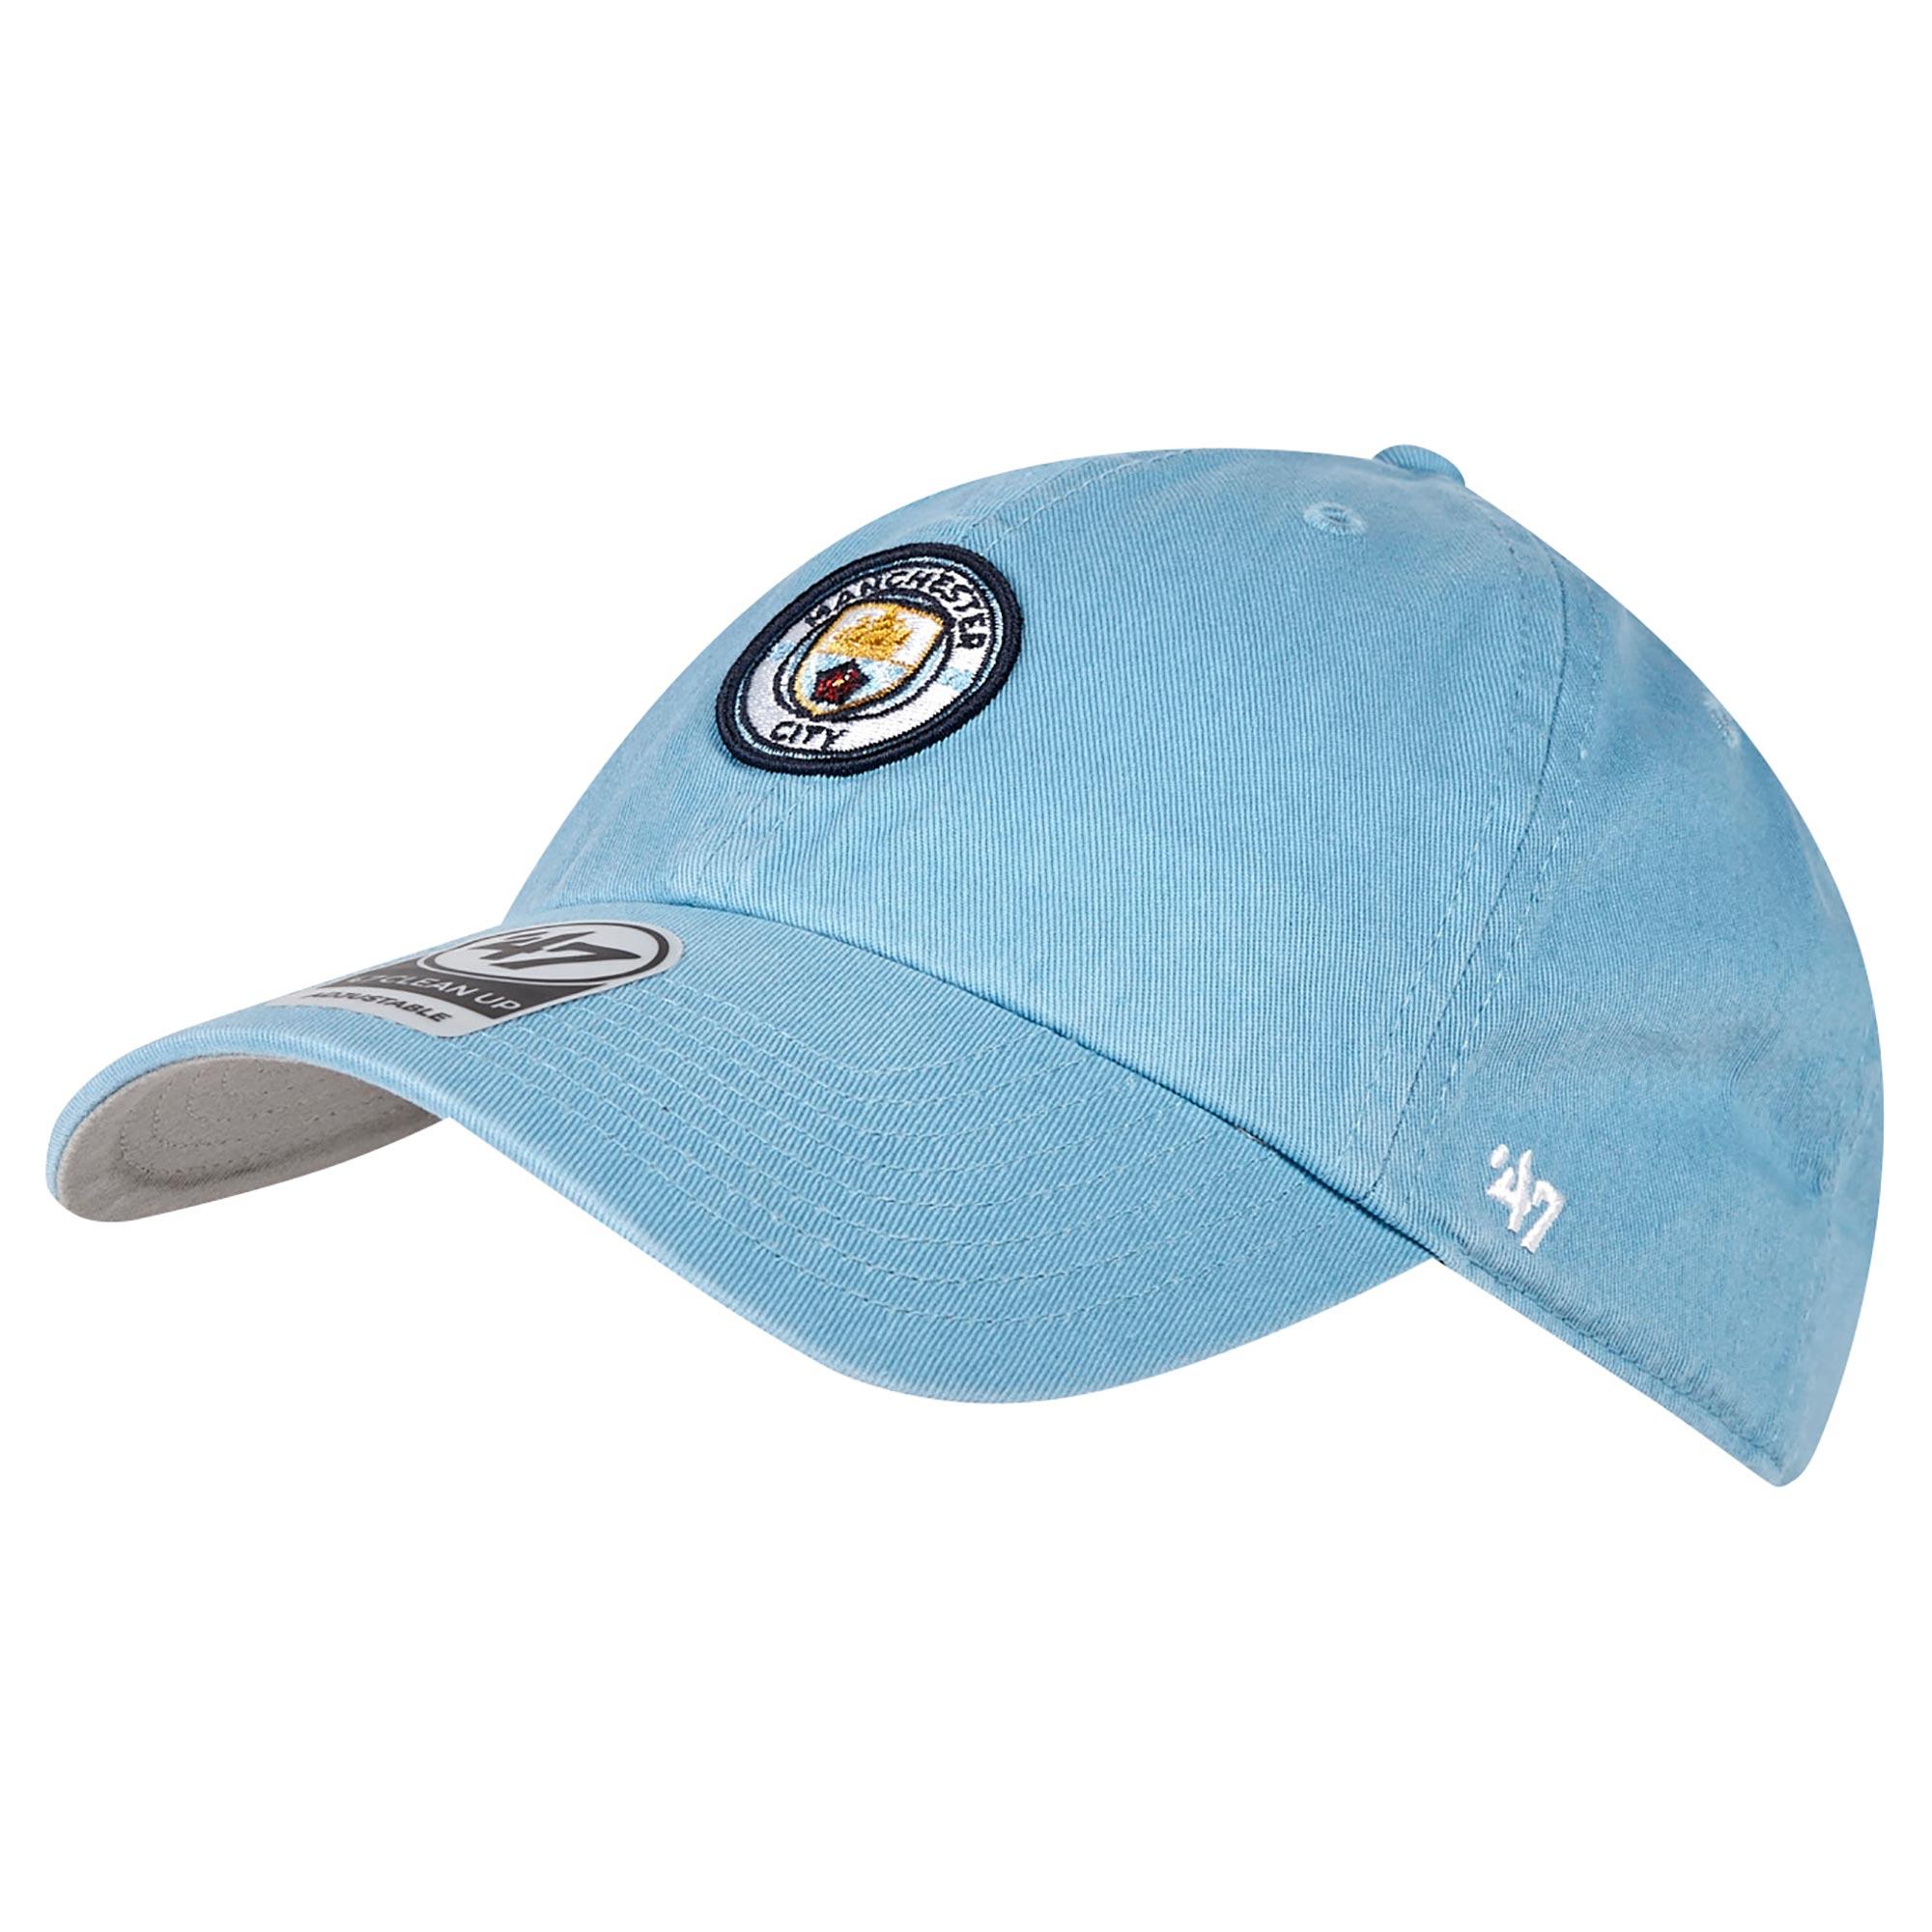 Manchester City 47 Abate Cap - sky